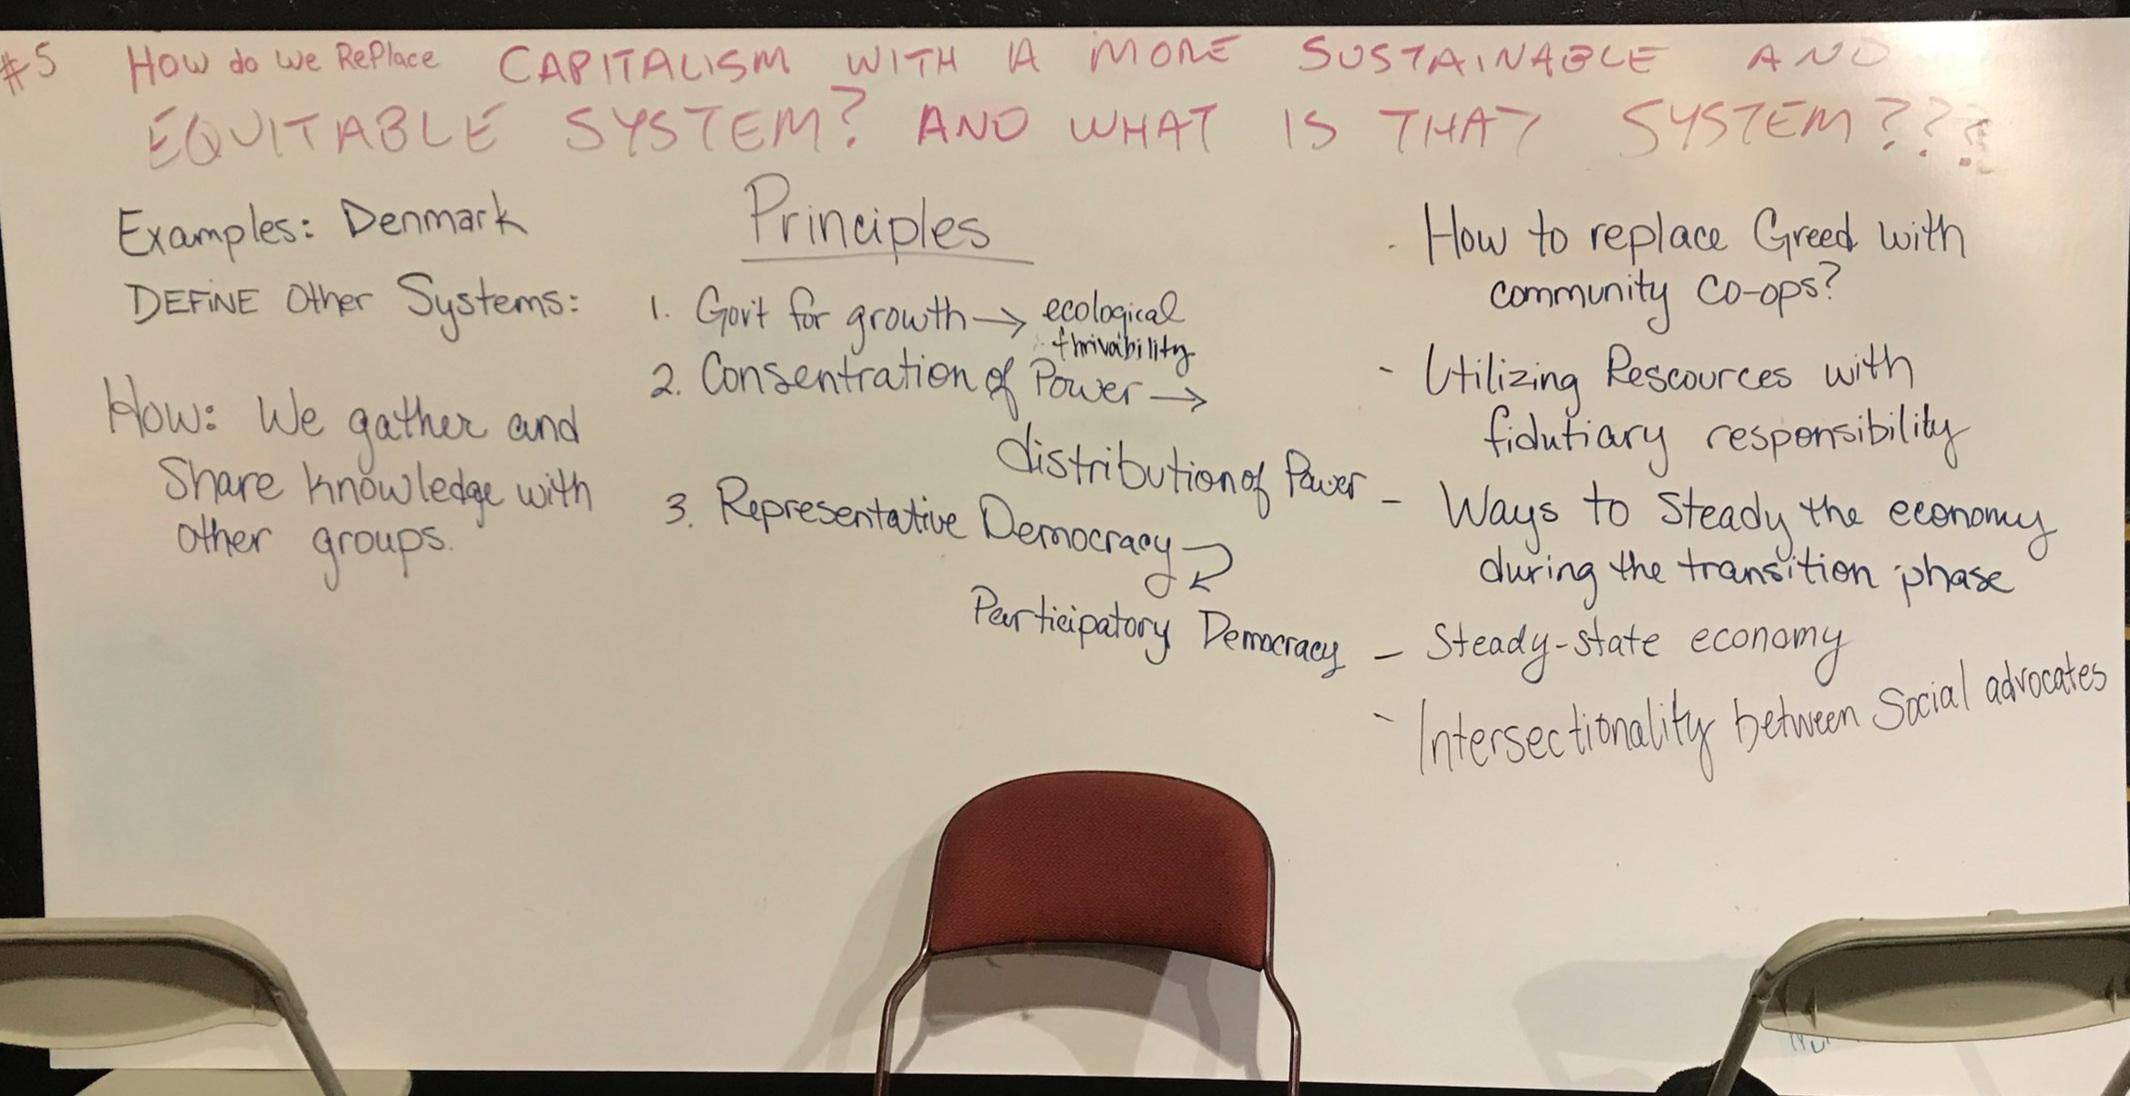 Compassionate+Economics+Study+Group.jpg